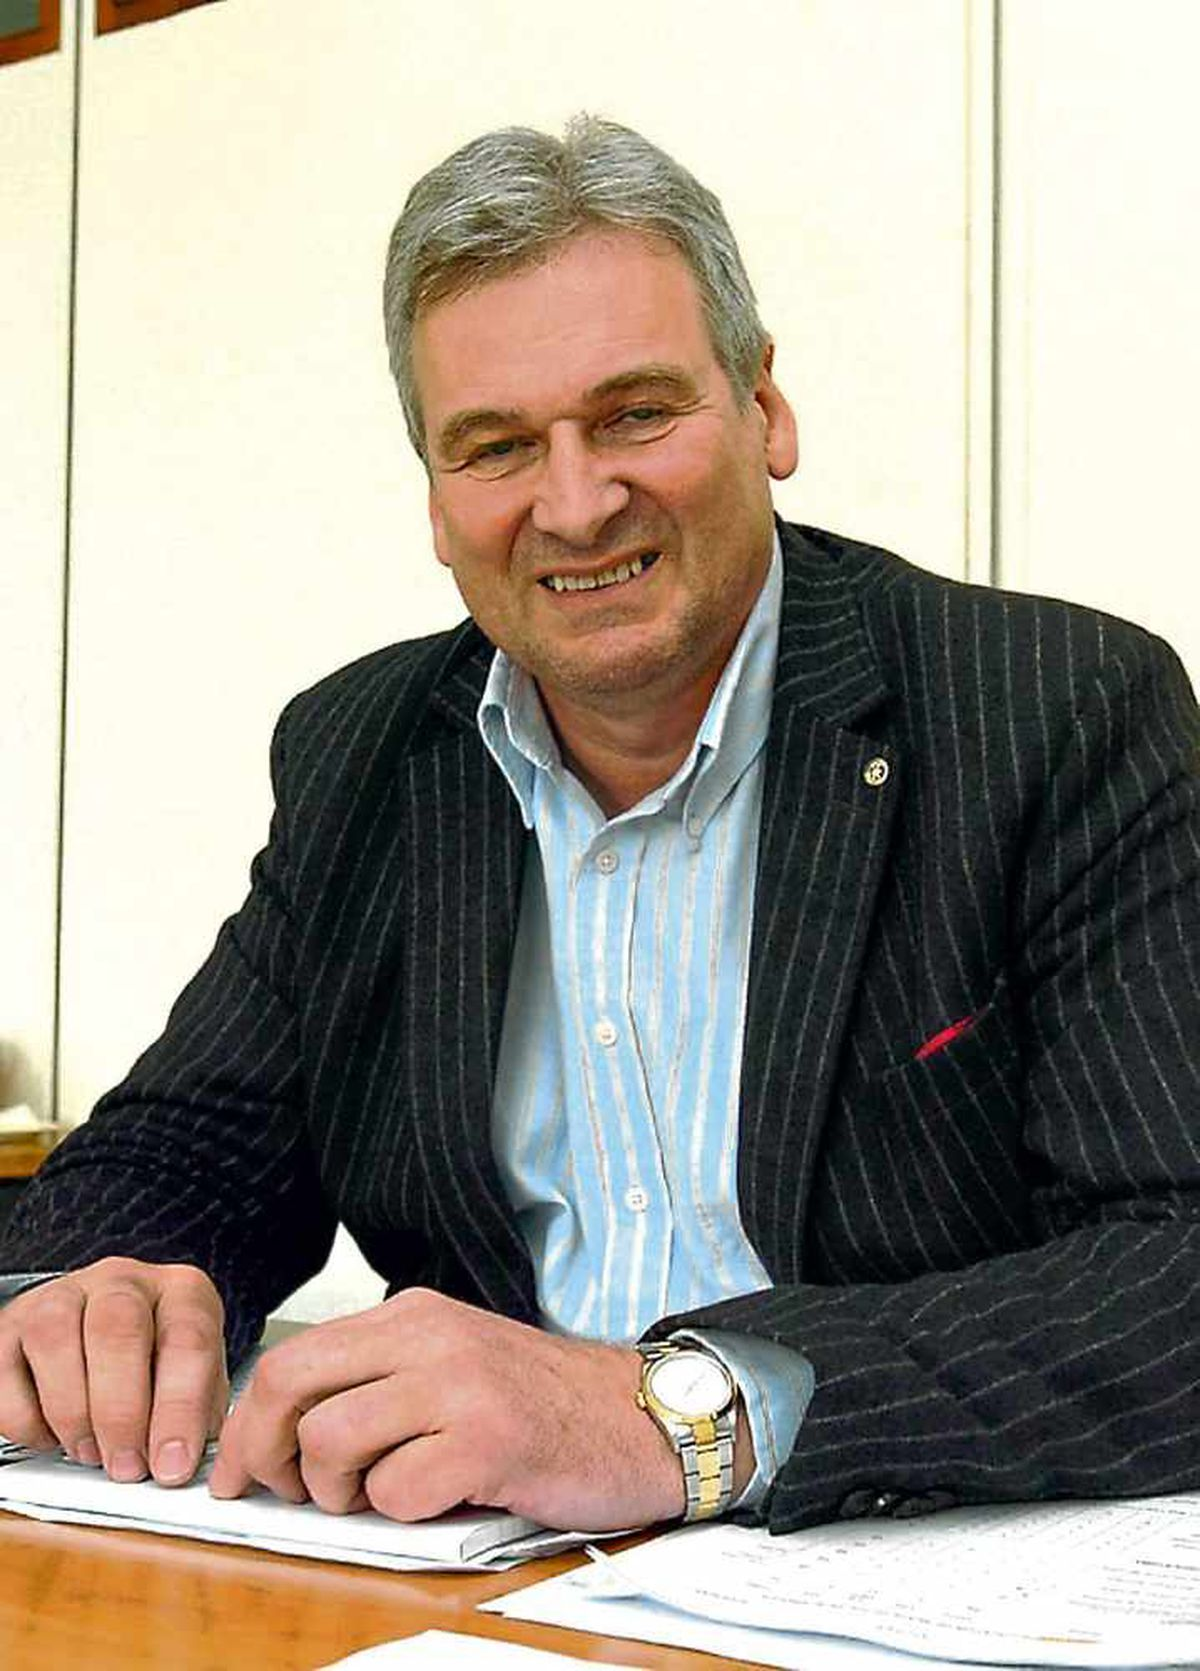 Leader of the council Keith Barrow